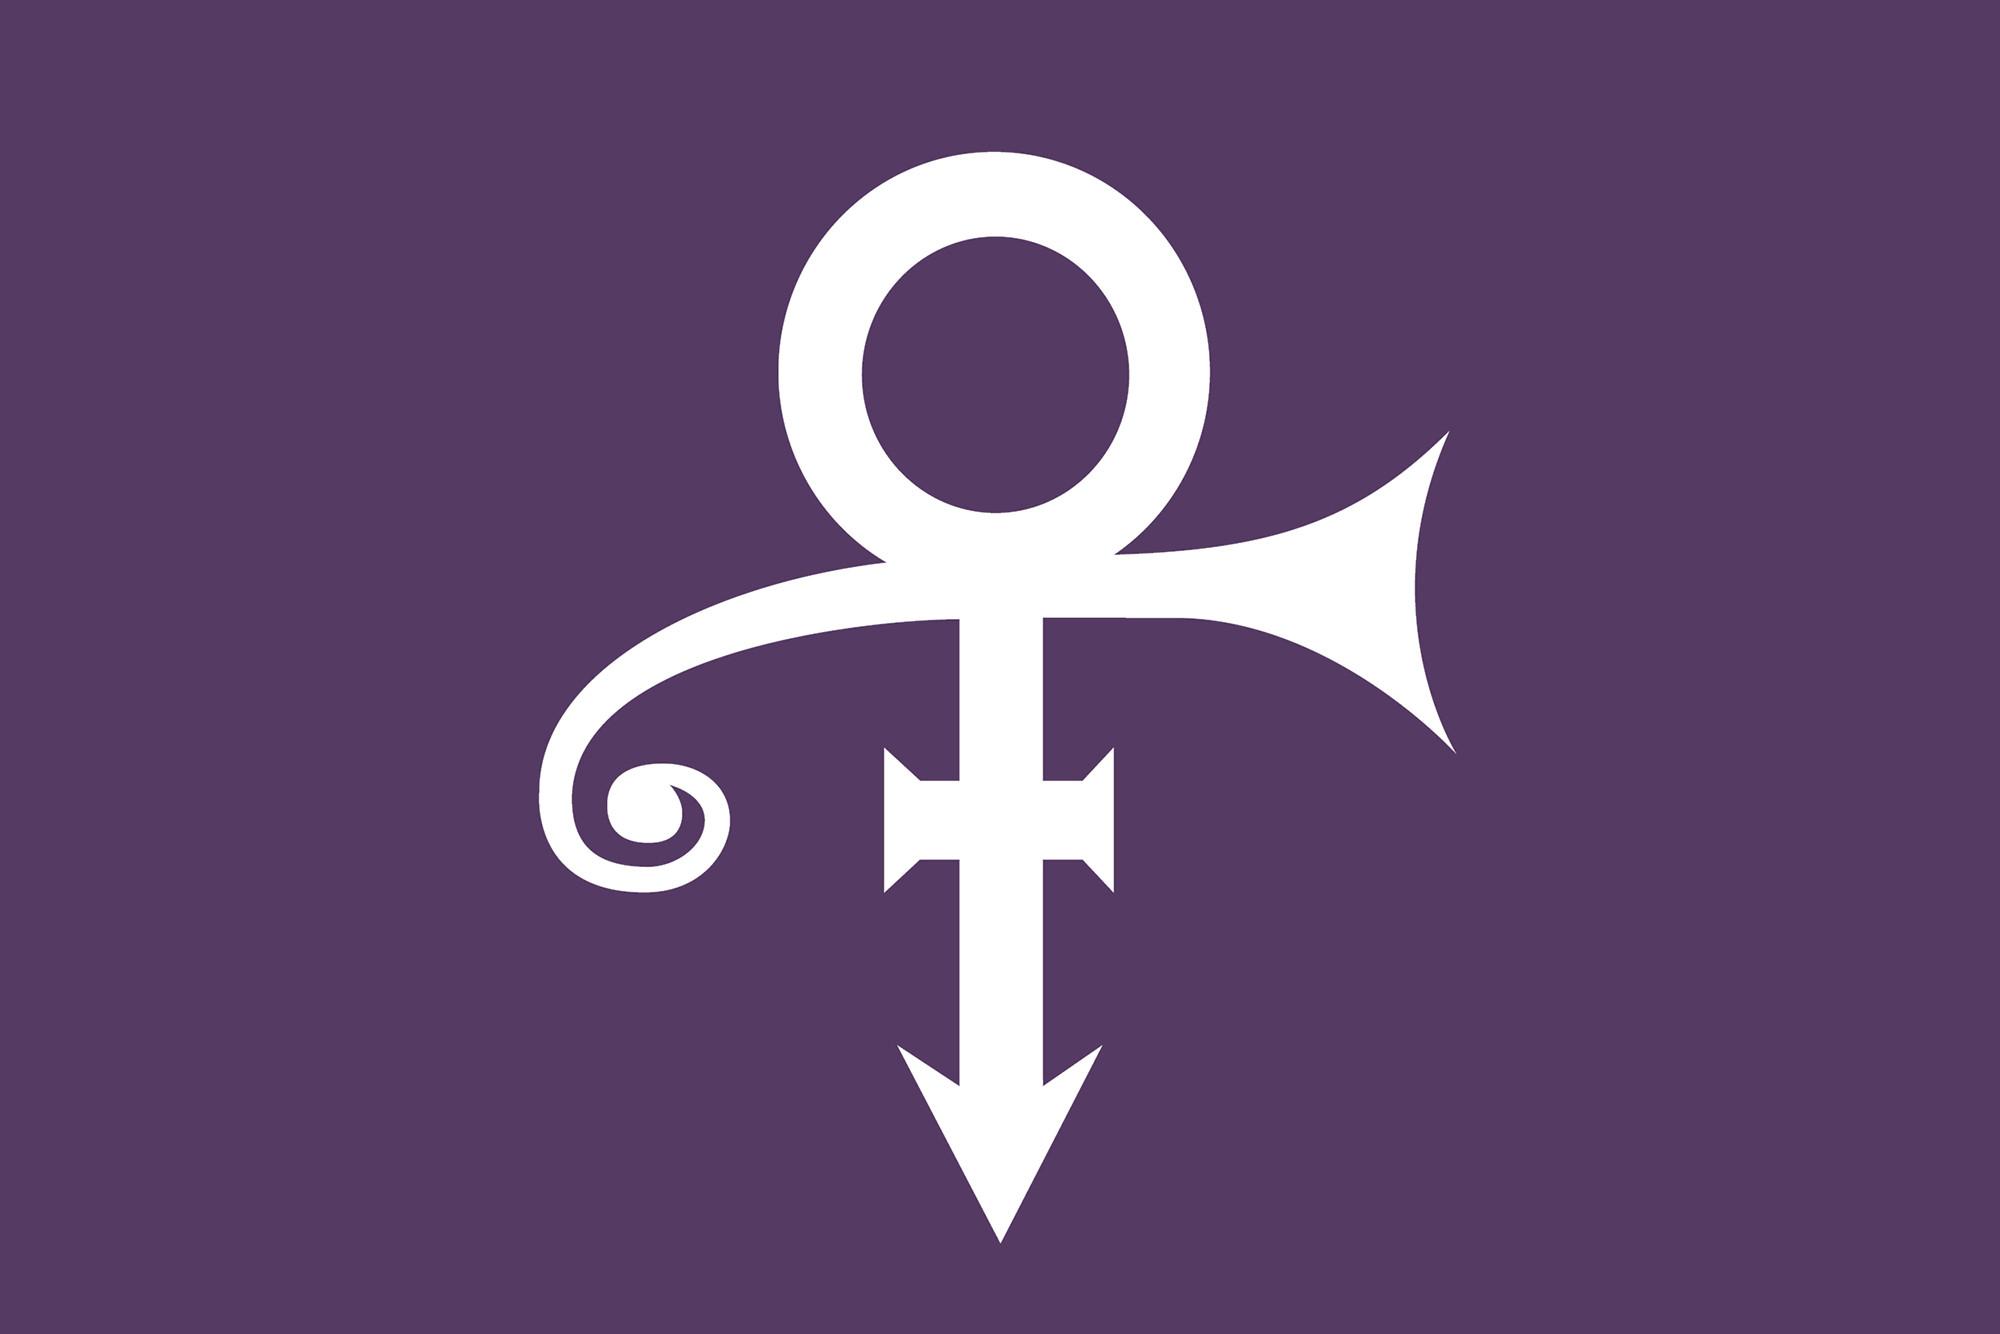 Pantone Honors Prince With Purple Hue | Architect Magazine | Products,  Paints, Pantone Color Institute